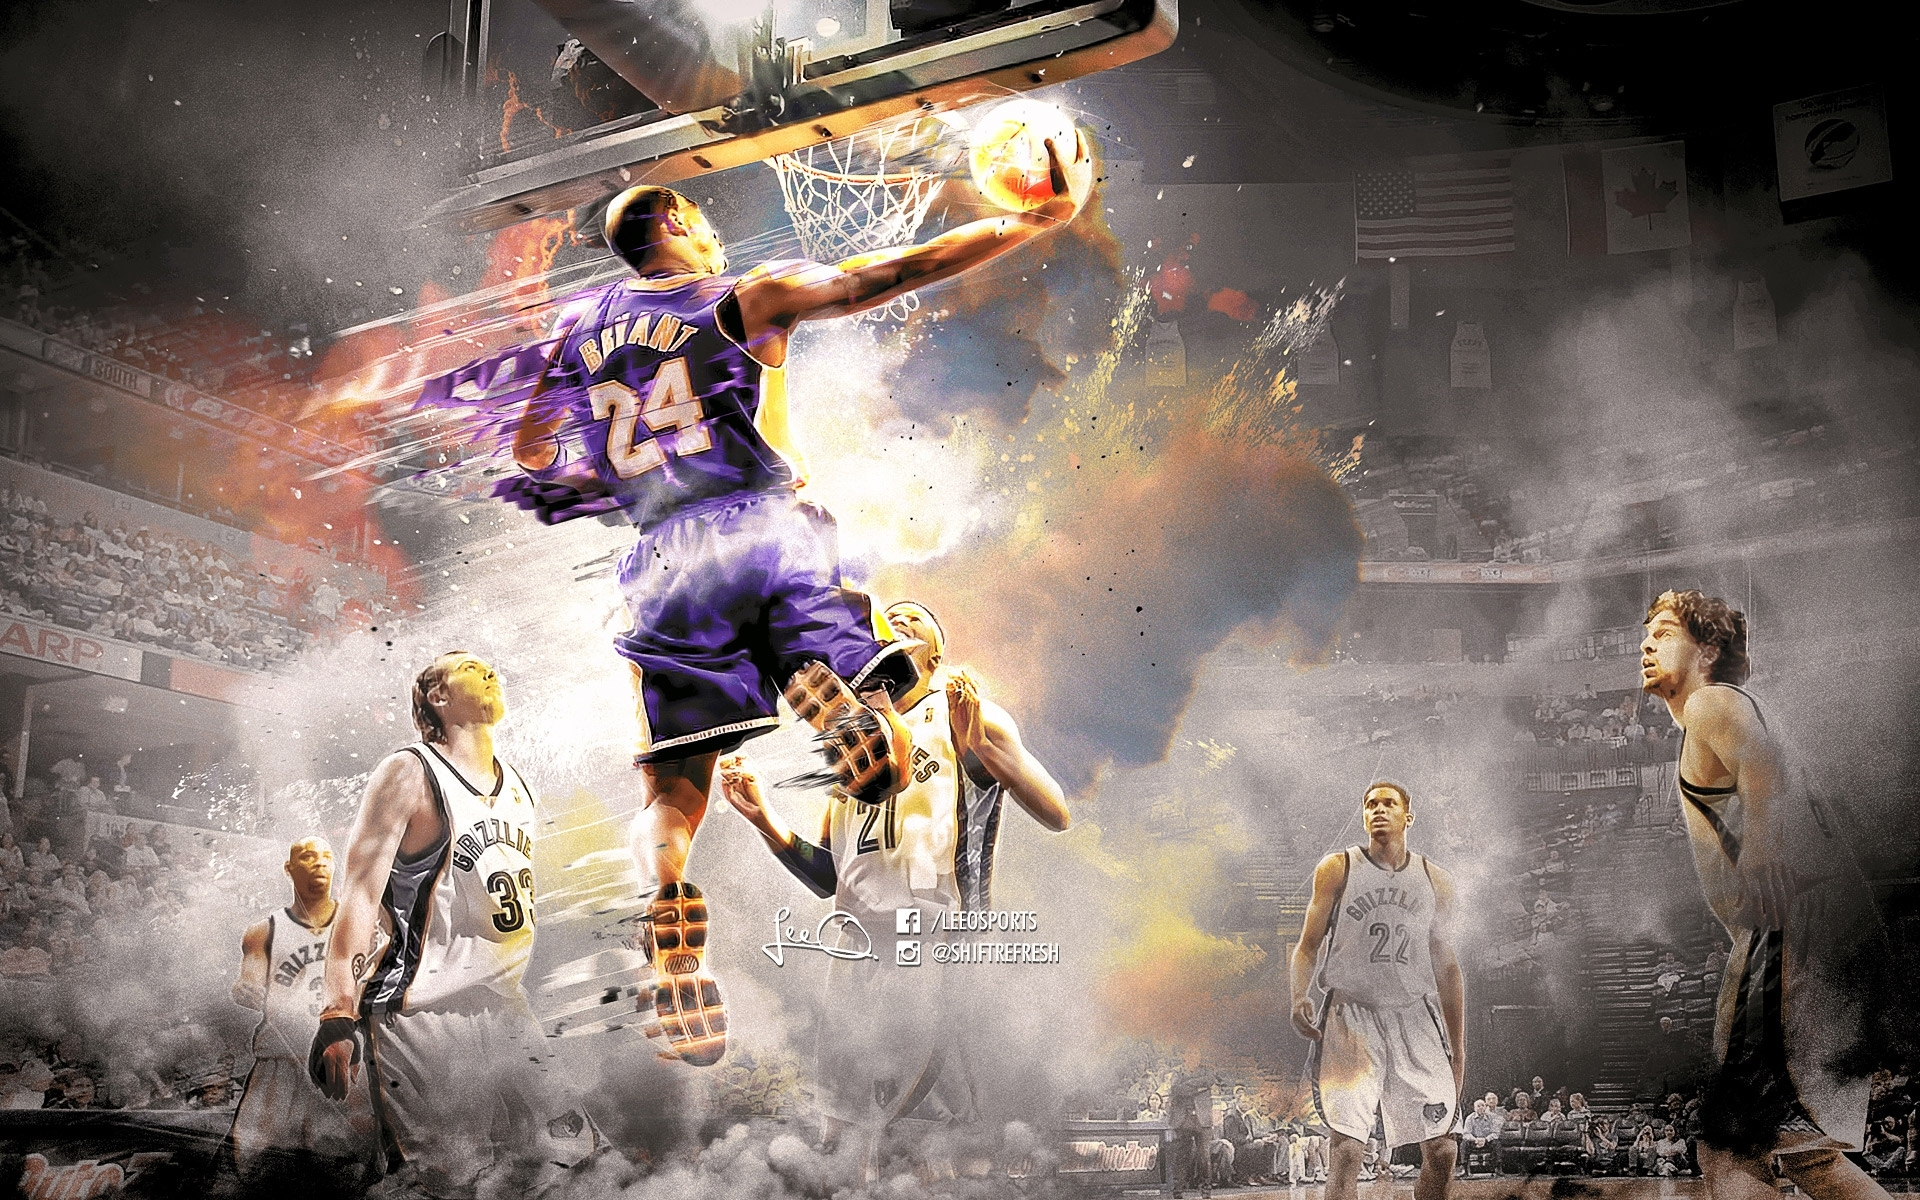 kobe bryant wallpapers | basketball wallpapers at basketwallpapers